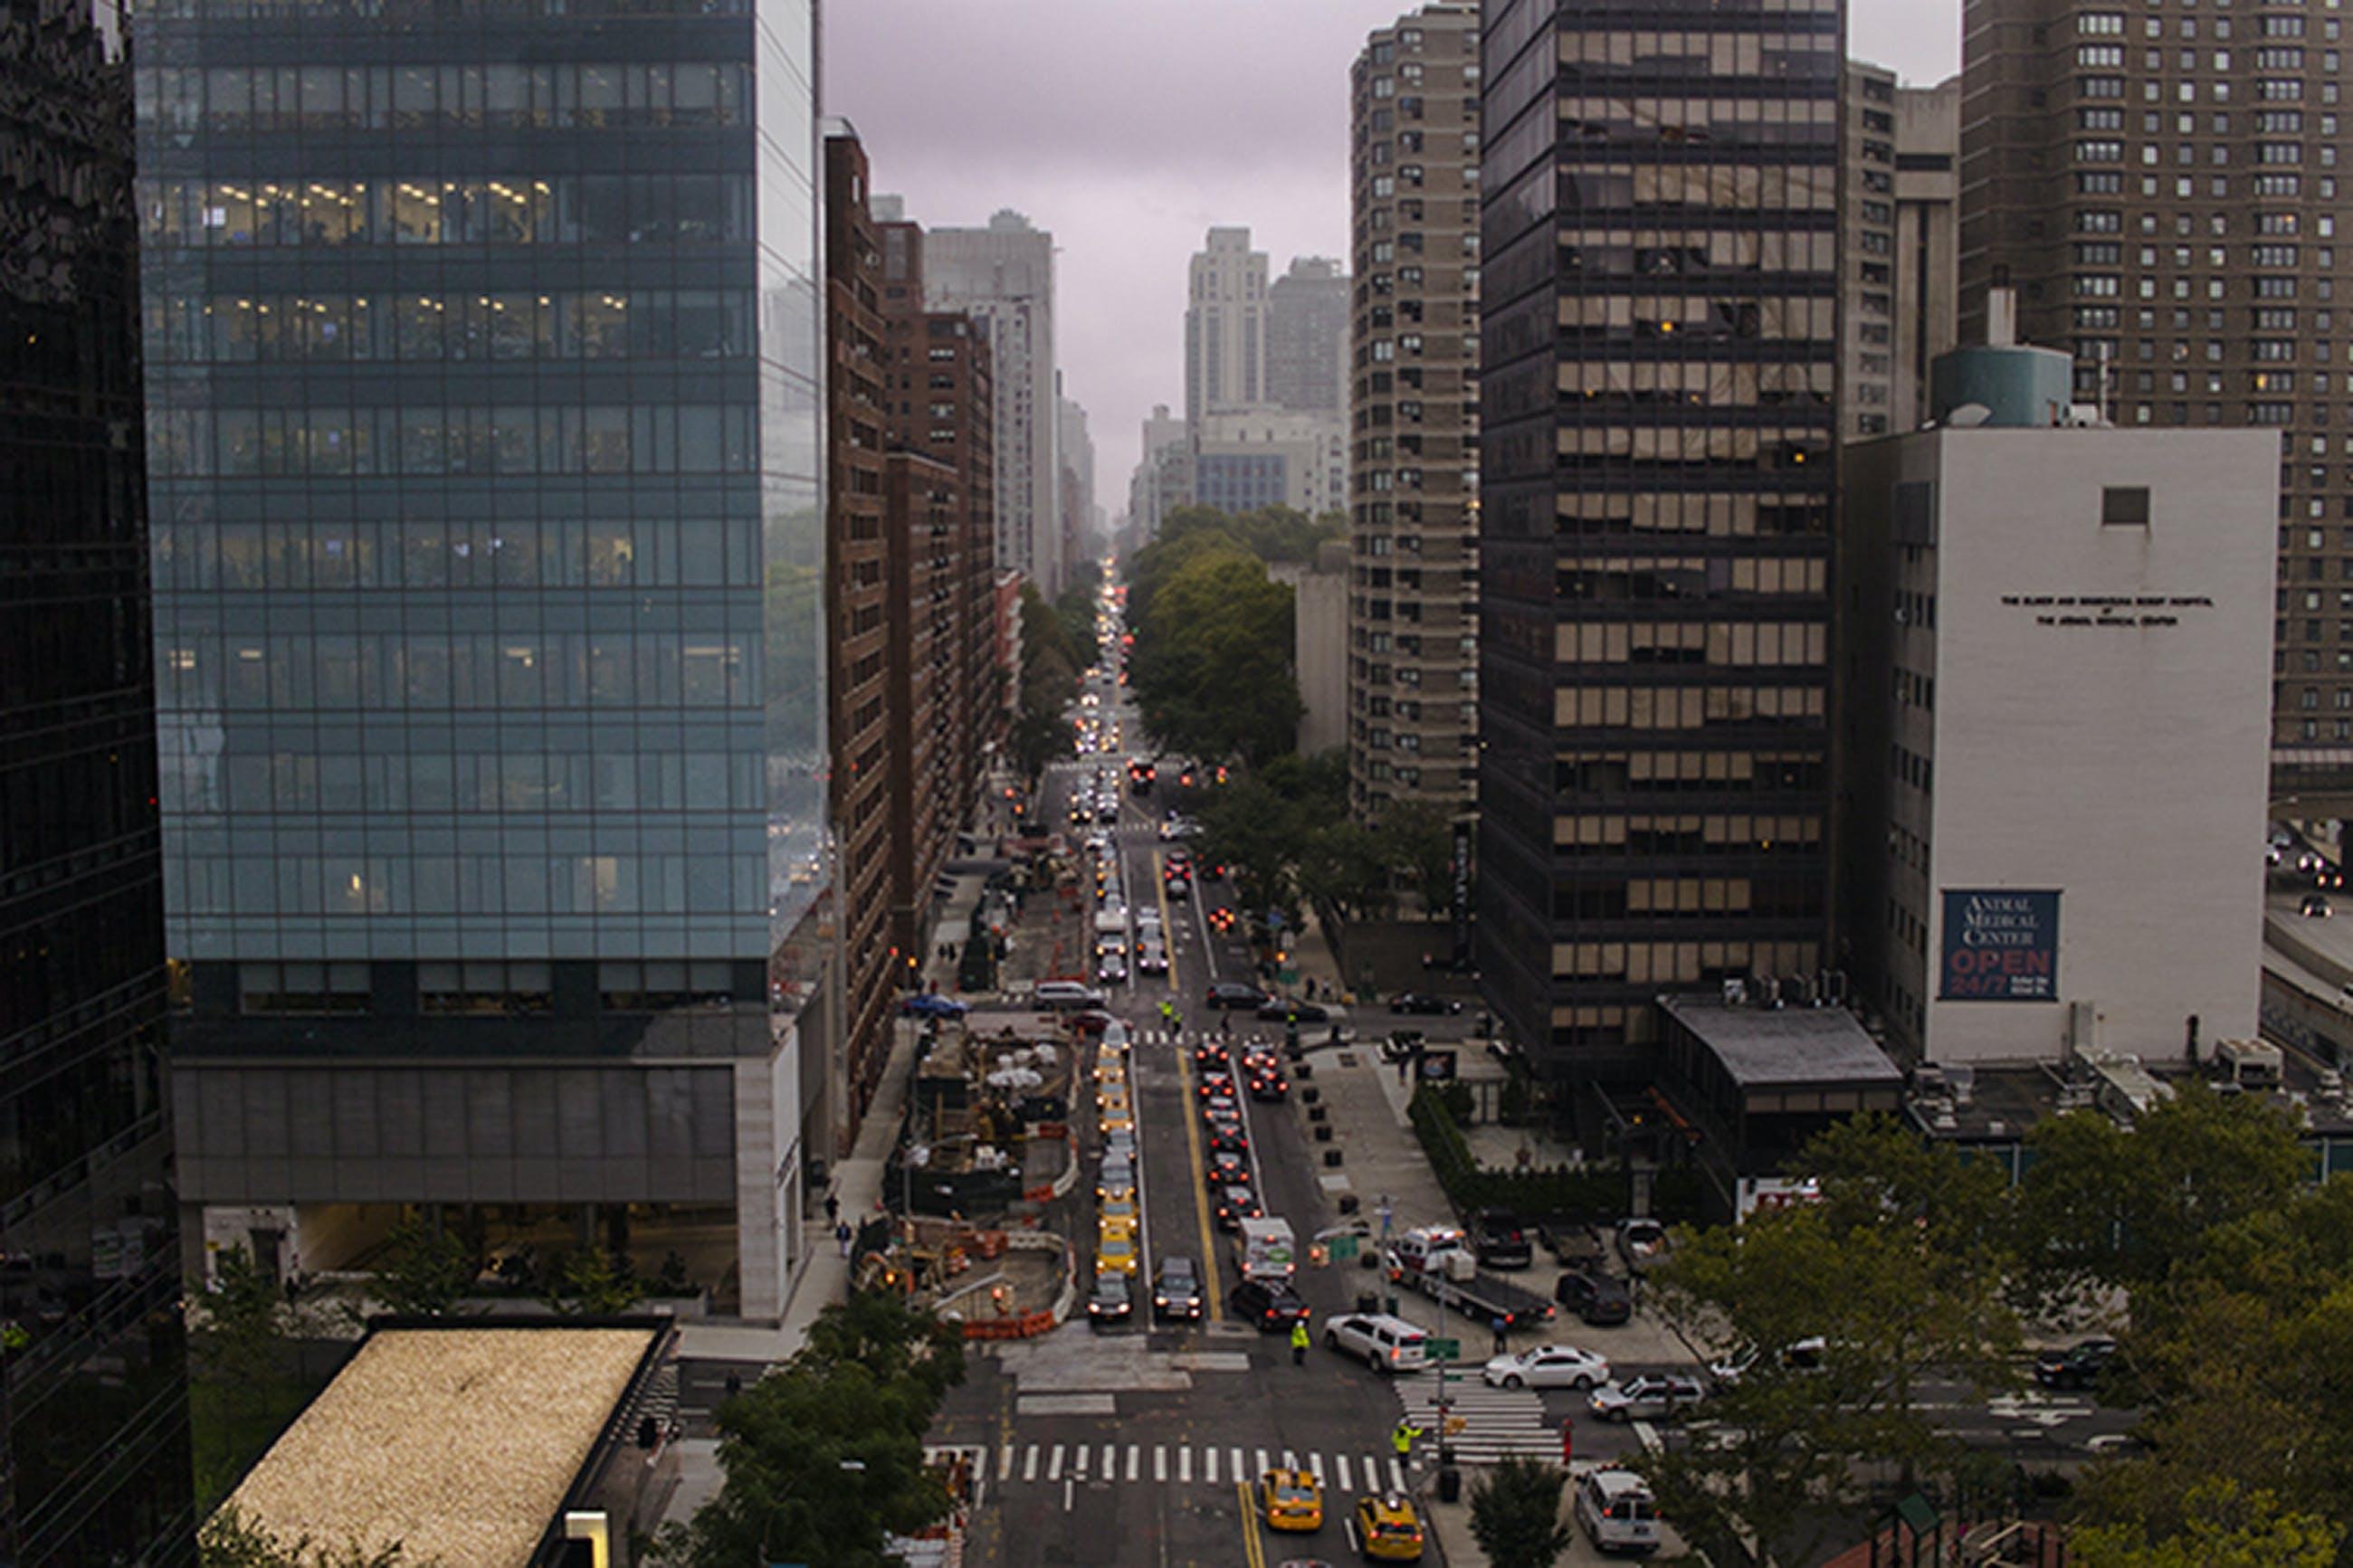 Free stock photo of #bigcity, #Cityscape, #citywide, #gonyc